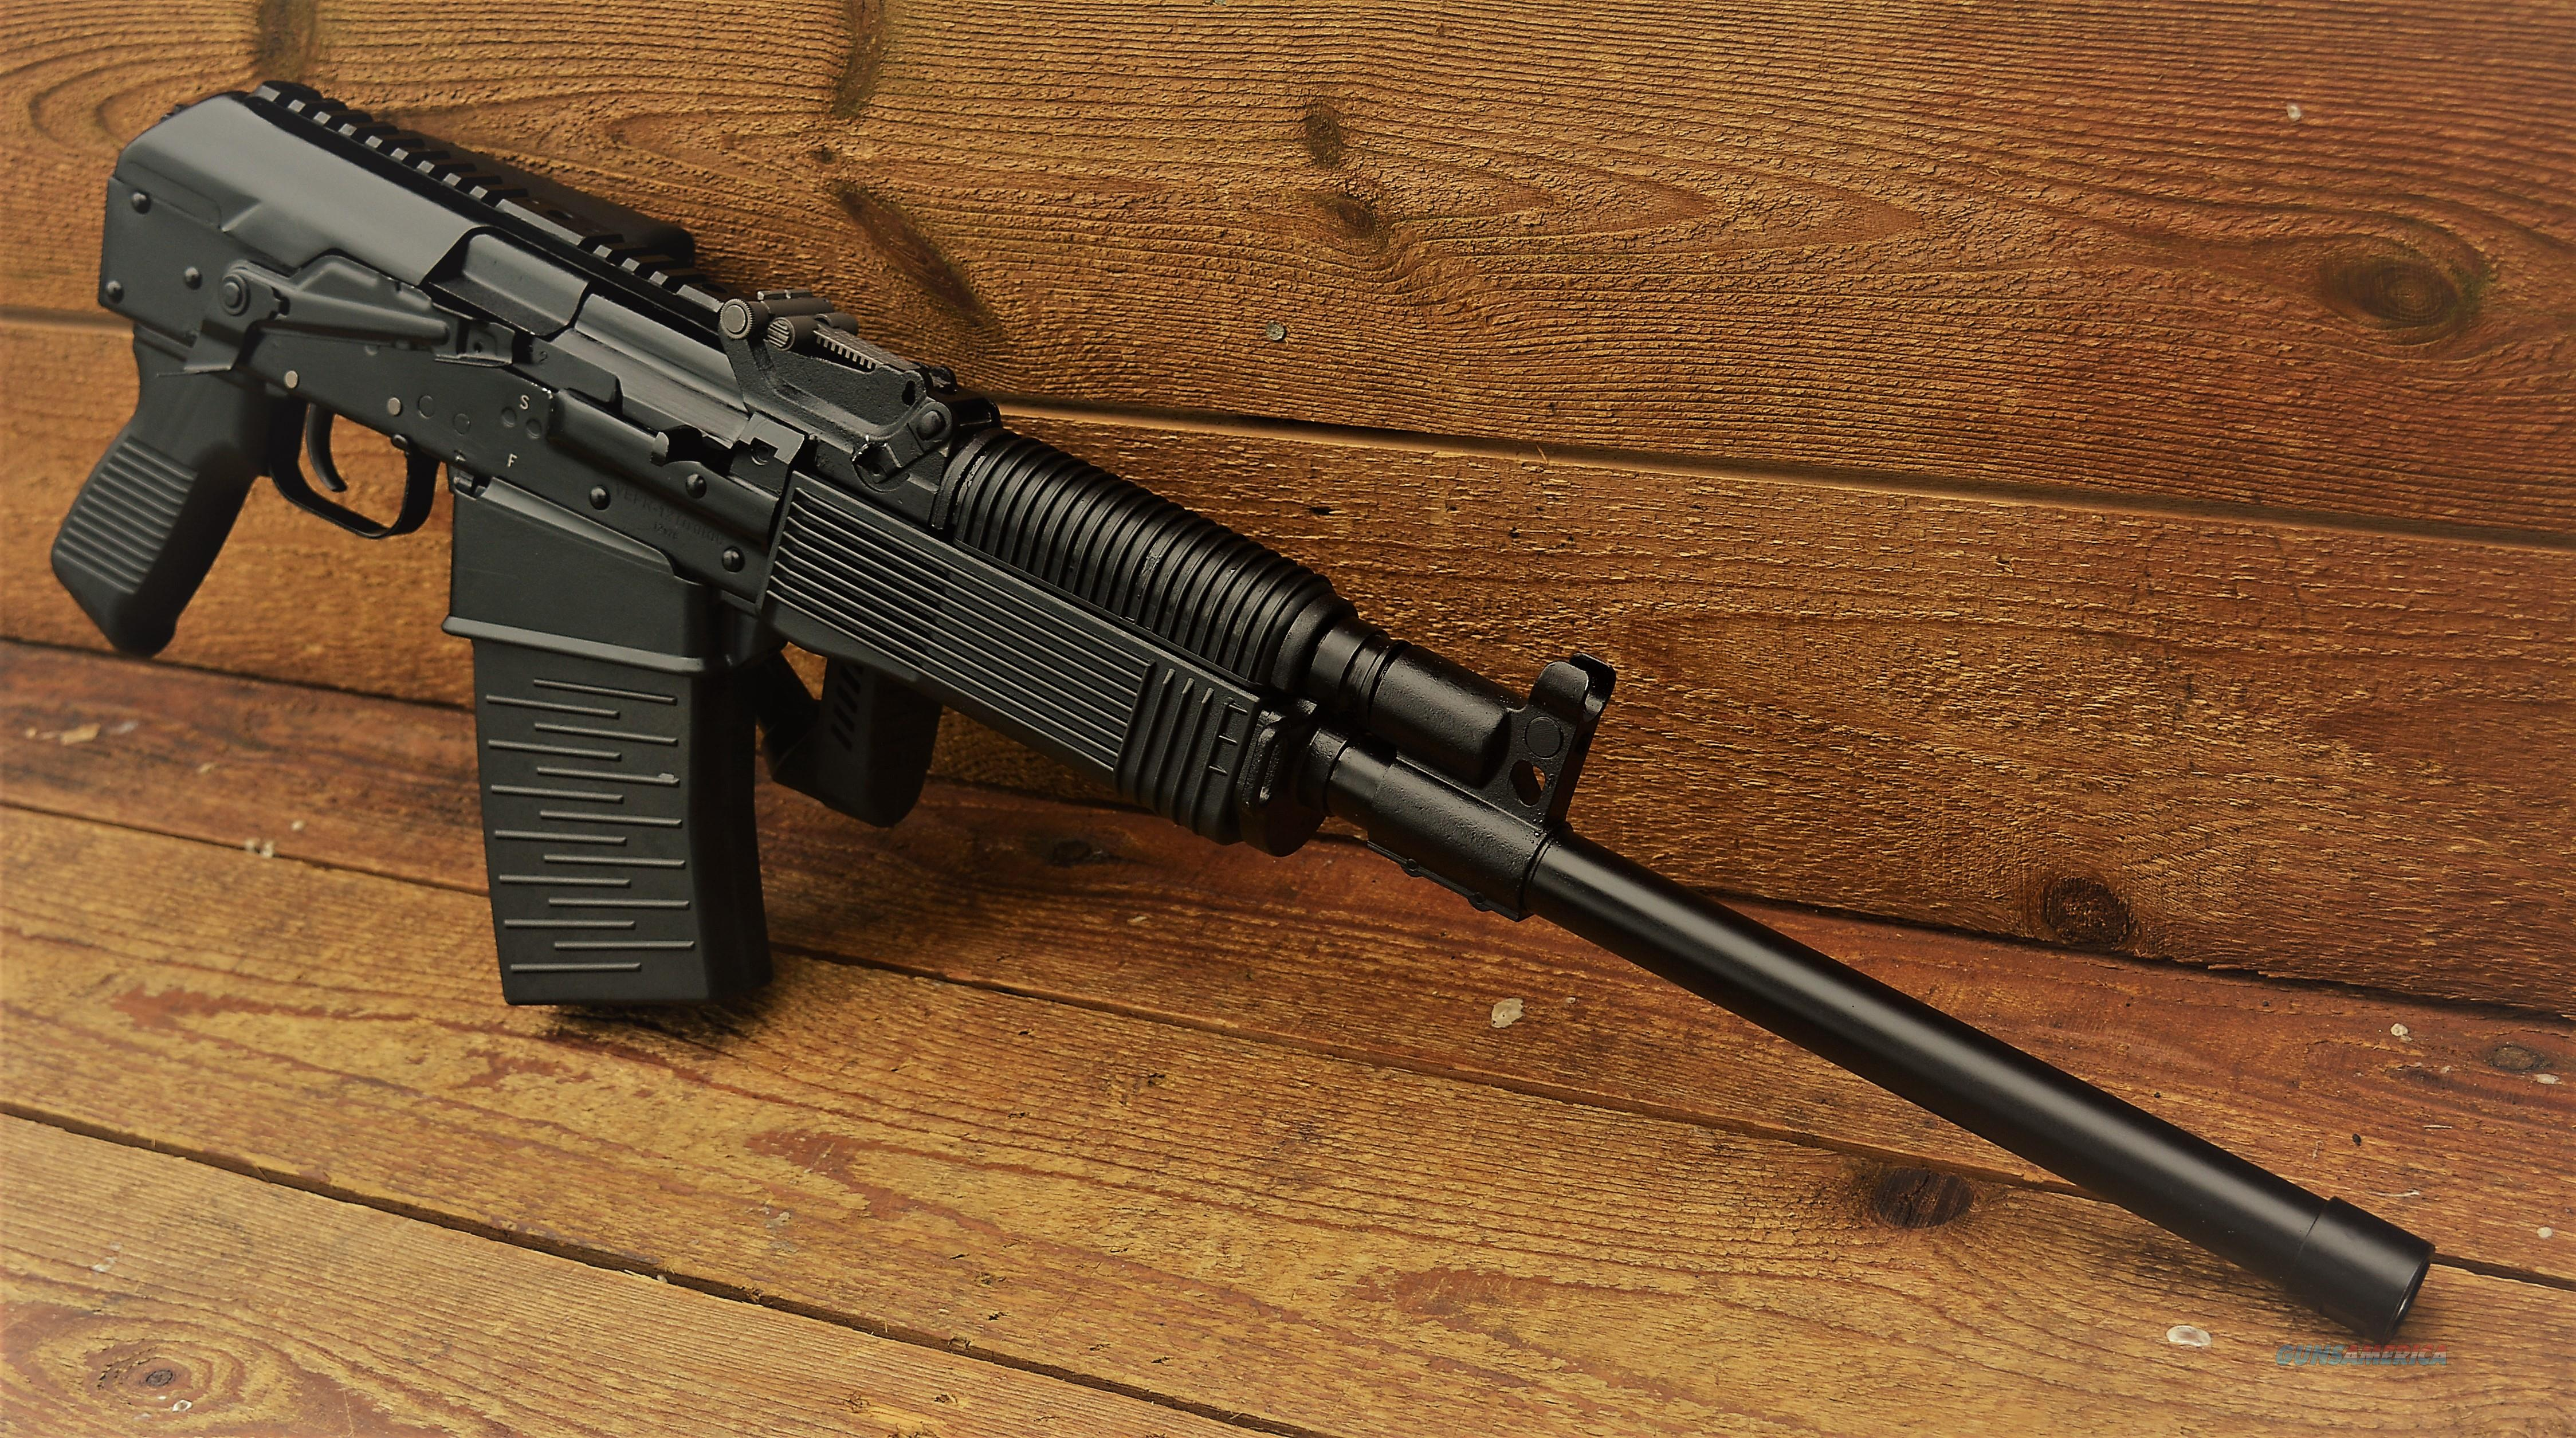 $103 EASY PAY  Back by Demand RUSSIA! Russian home of the KGB Left Side Folding Molot Left side Folder Vepr Sorry No Sale  California Built Like a Tank 12ga shotgun THREADED BARREL Pistol Grip CHROME LINED  Hunting magazine RPK VPR1203   Guns > Shotguns > MN Misc Shotguns